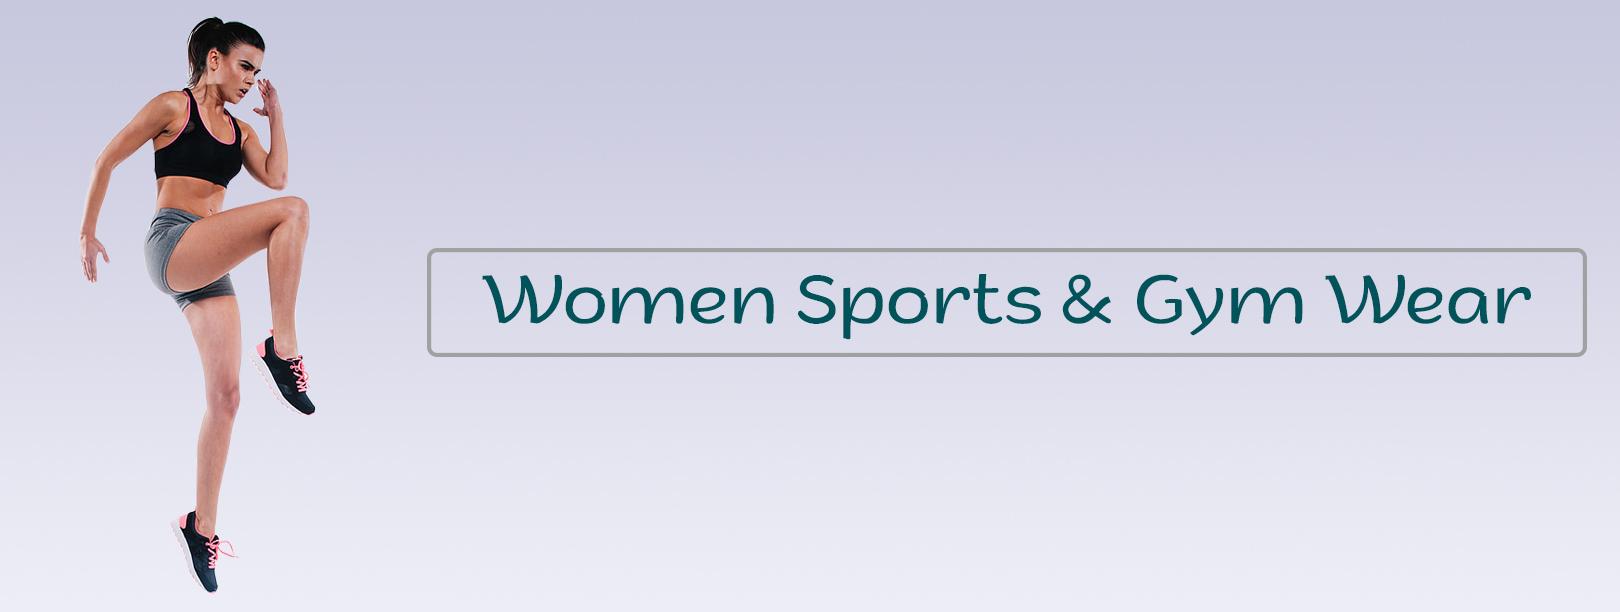 Flipkart Women Sports And Gym Wear